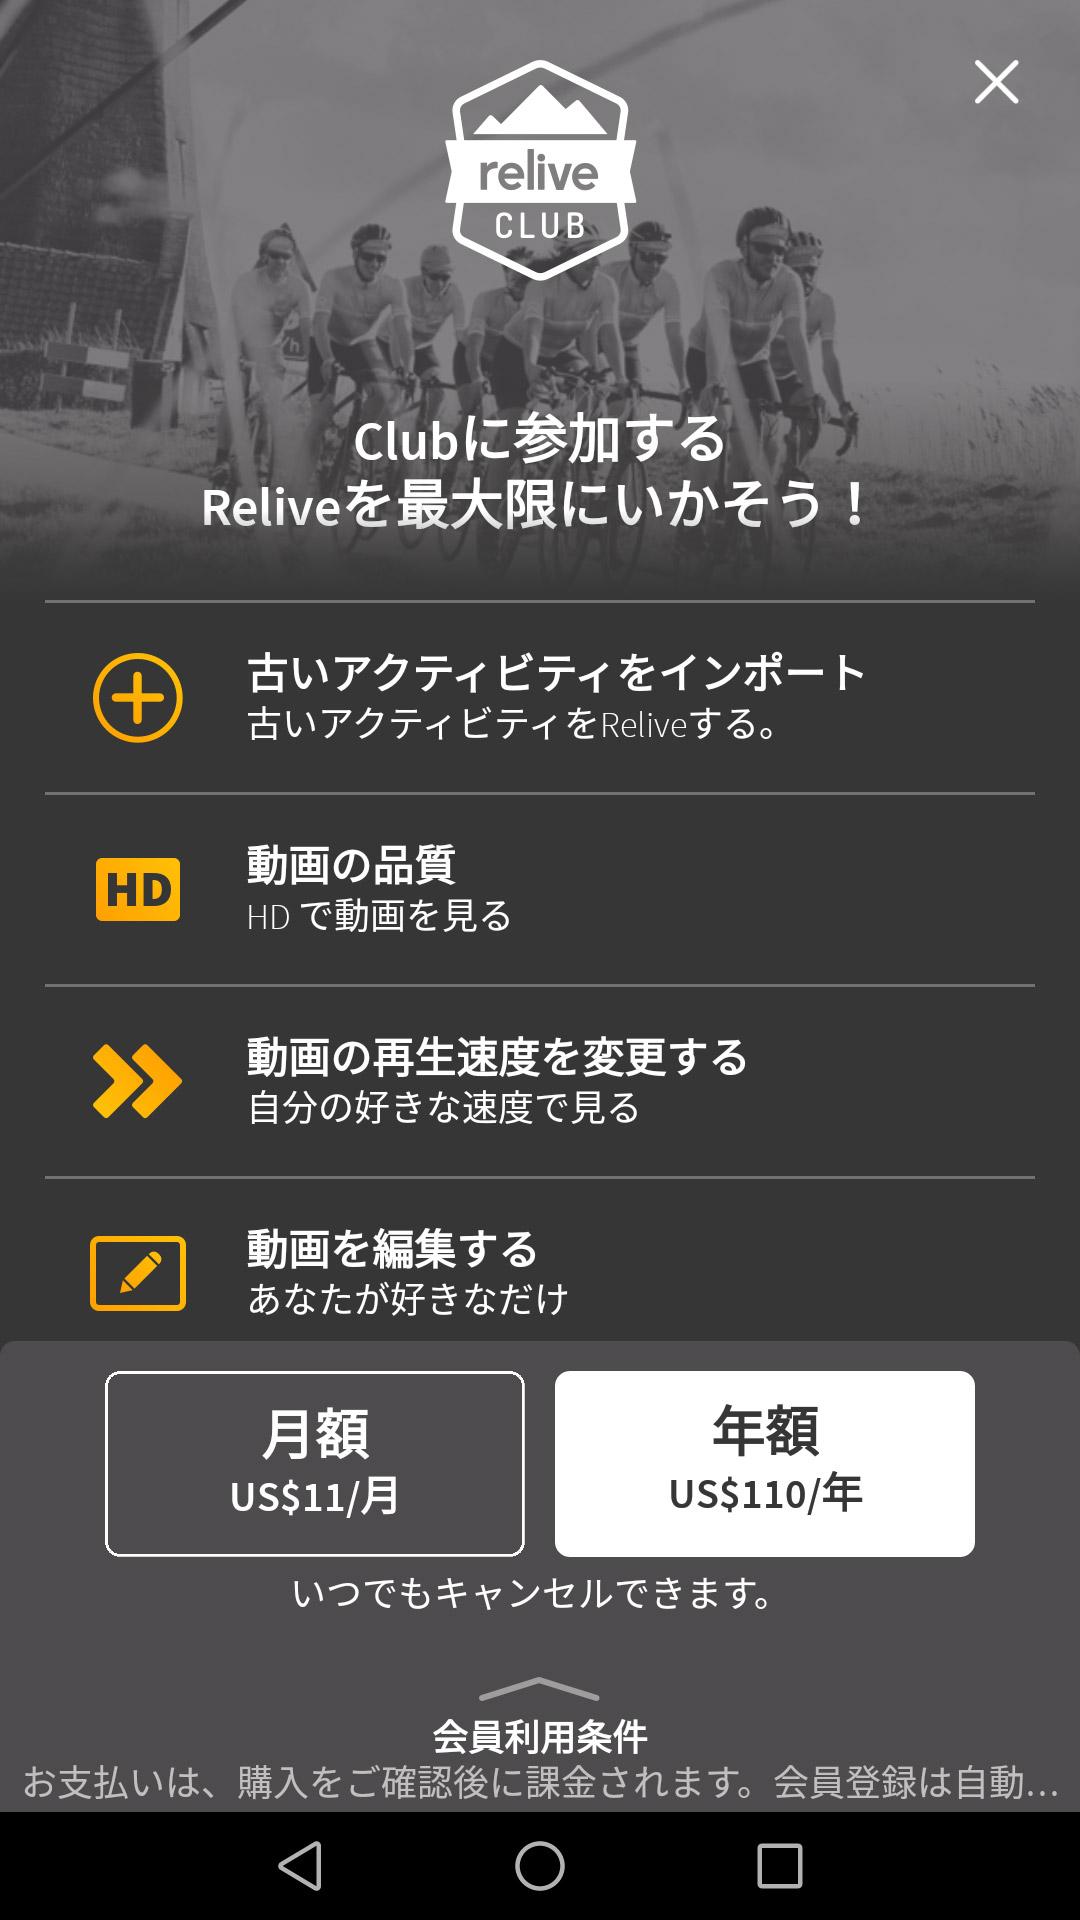 RELIVE CLUB設定画面